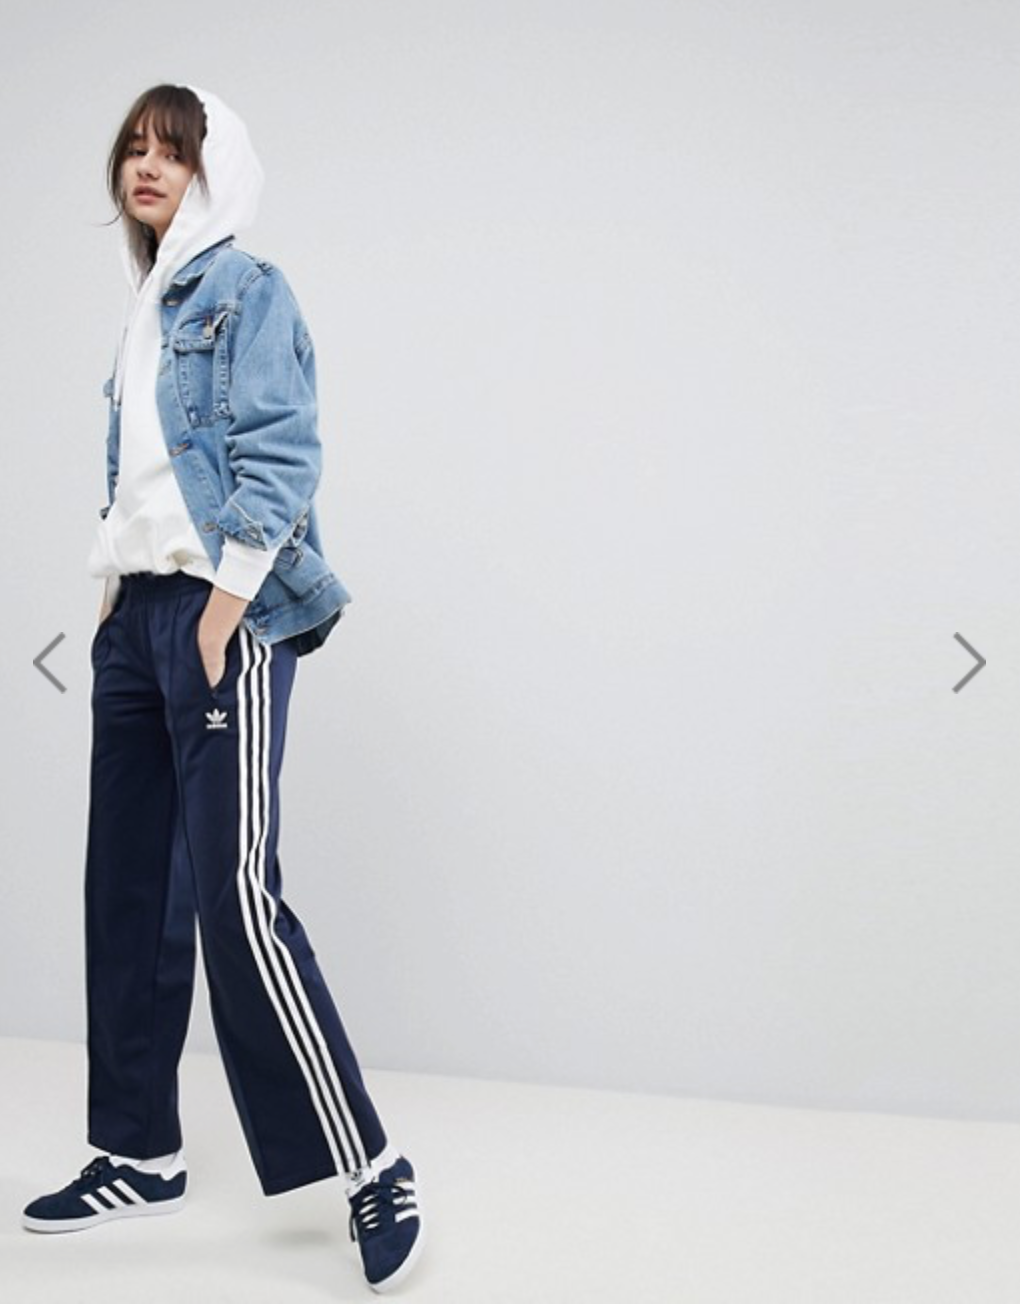 Hoodie L Jeans Jacket L Track Pants Adidas Track Pants Outfit Adidas Pants Outfit Adidas Outfit [ 1308 x 1020 Pixel ]